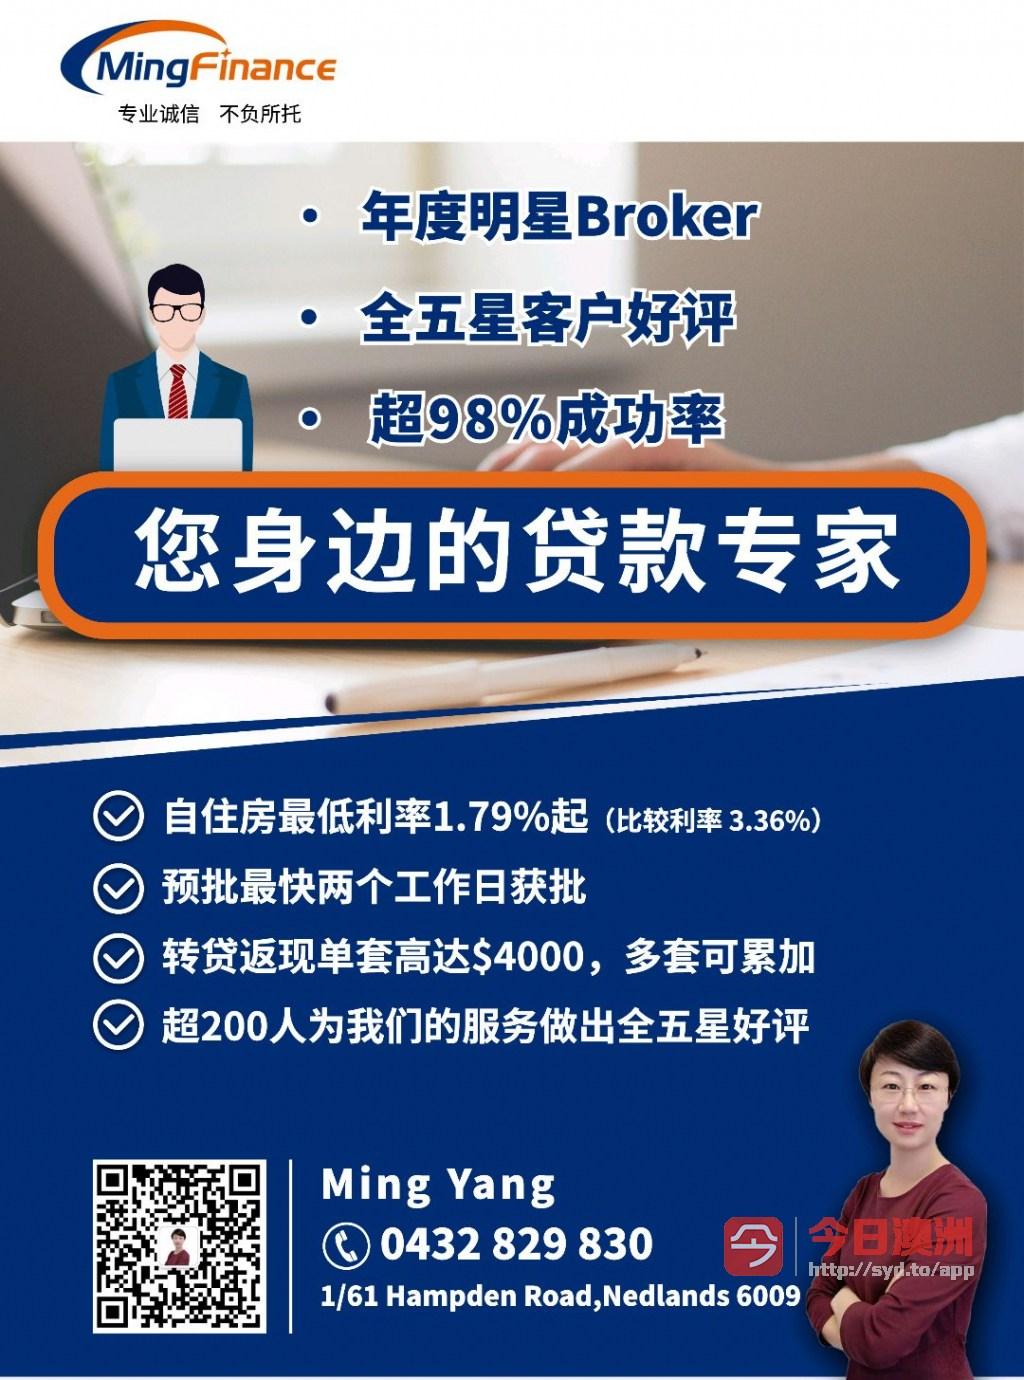 Ming  Finance 您身边的五星好评贷款顾问